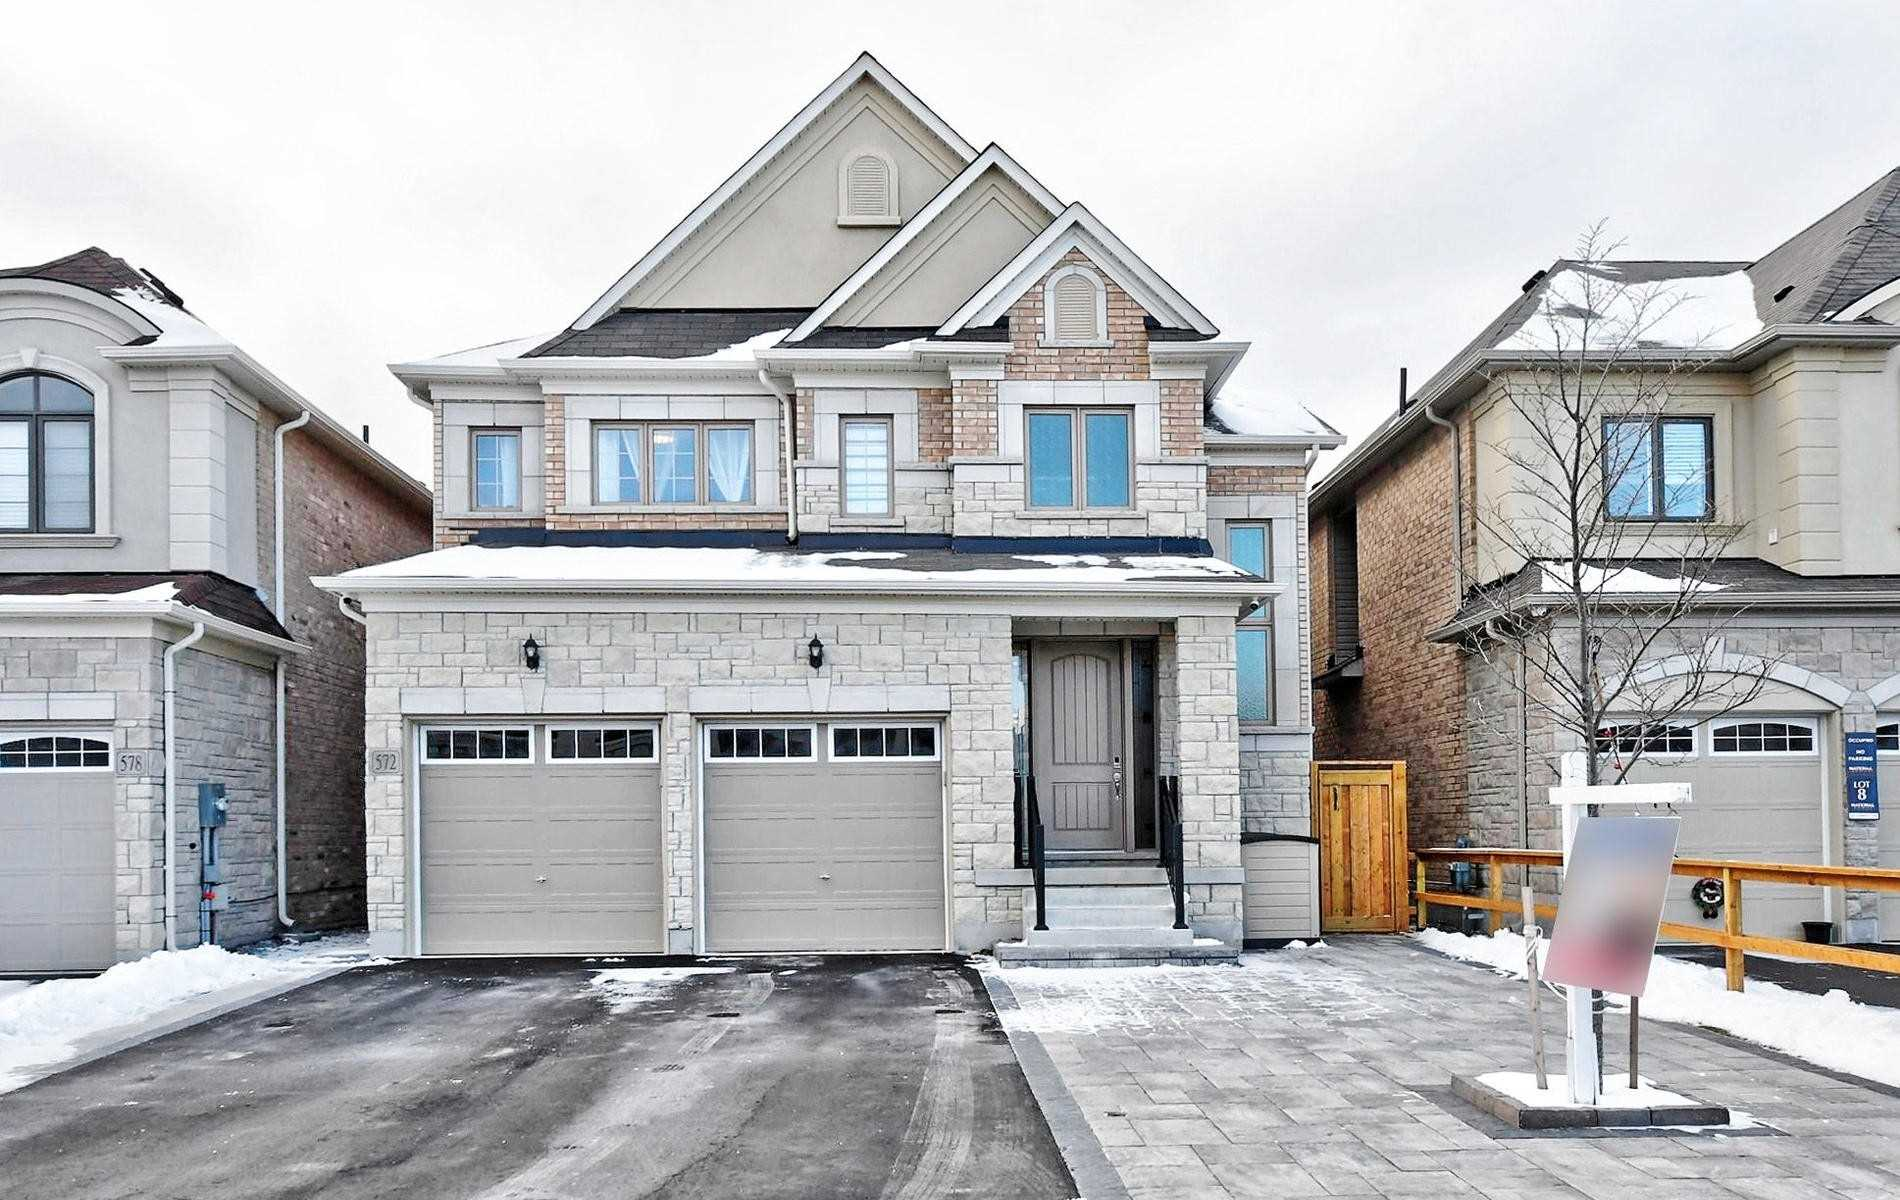 572 Somerville Dr, Newmarket Ontario, Canada